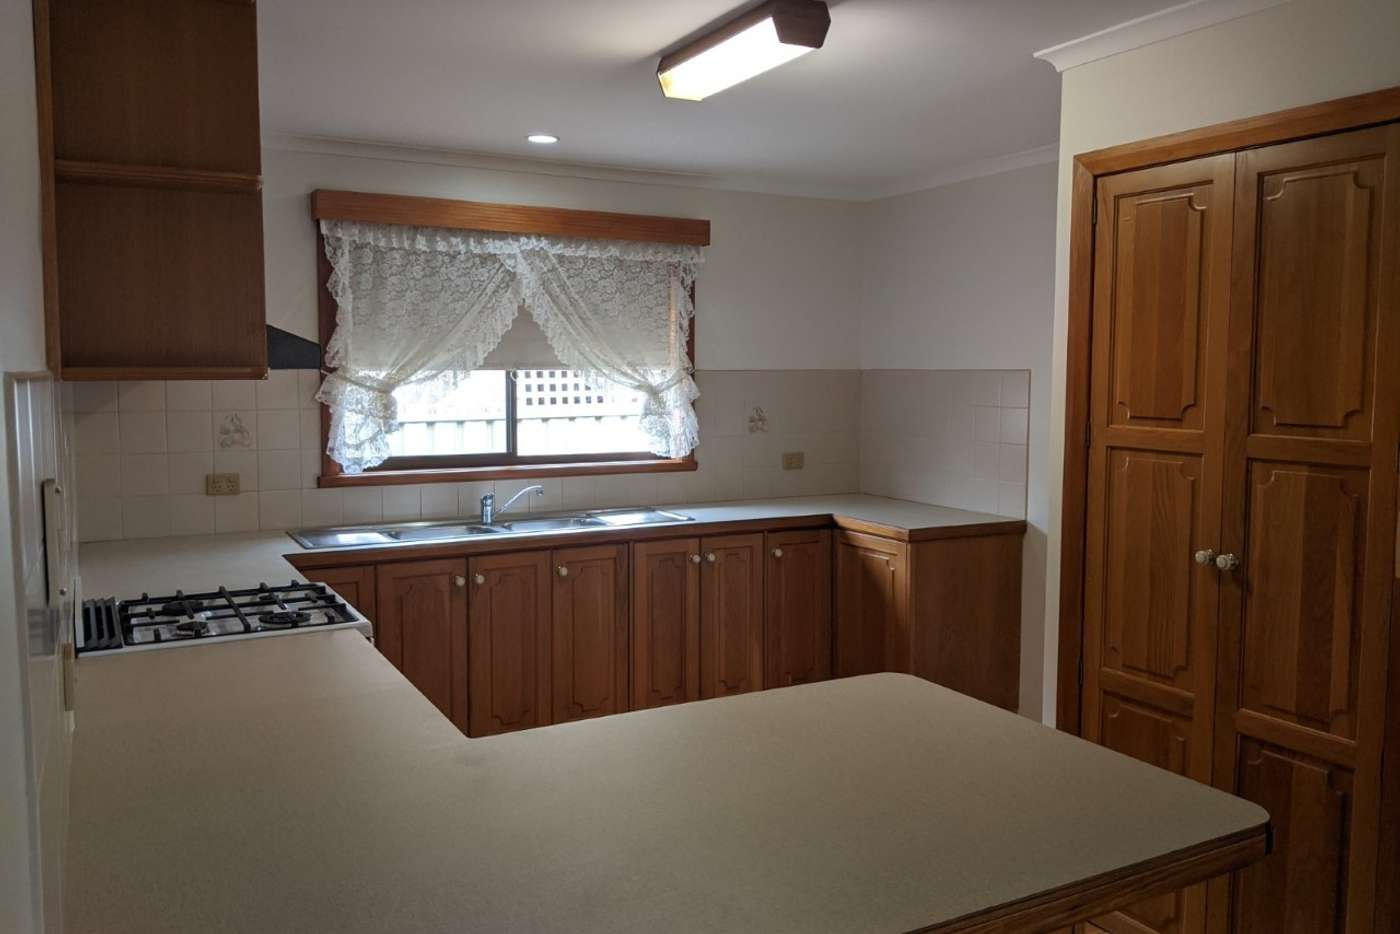 Sixth view of Homely house listing, 11 Roadshow Drive, Wodonga VIC 3690